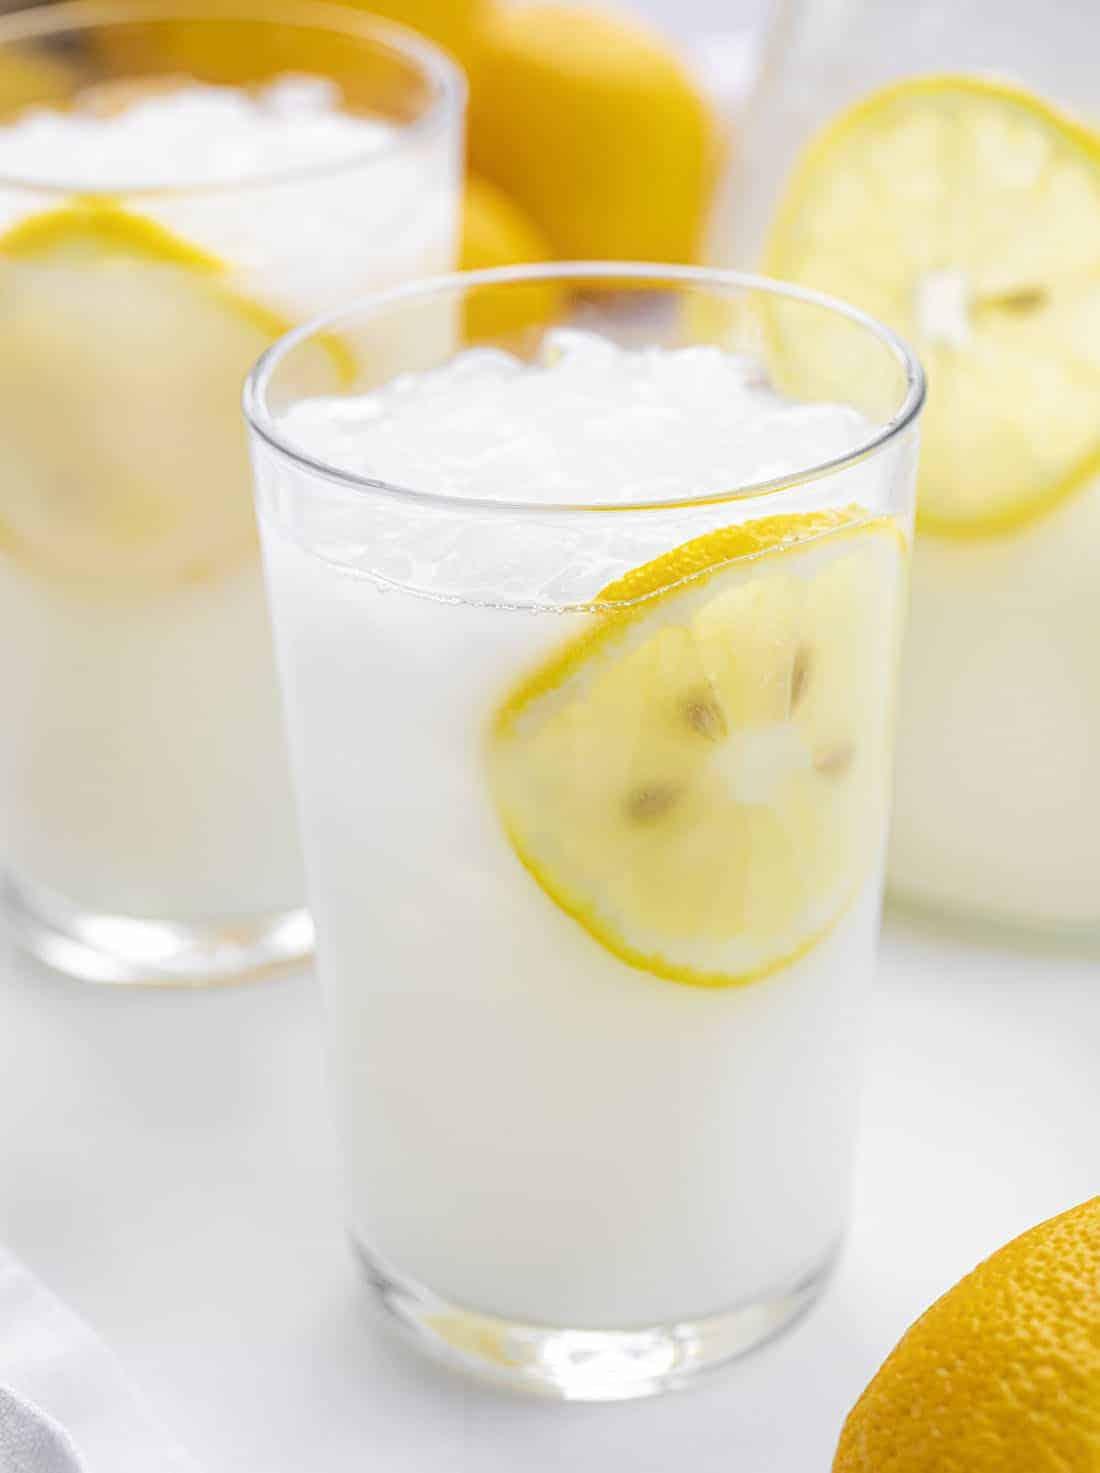 Glass of Creamy Lemonade - Brazilian Lemonade Recipe